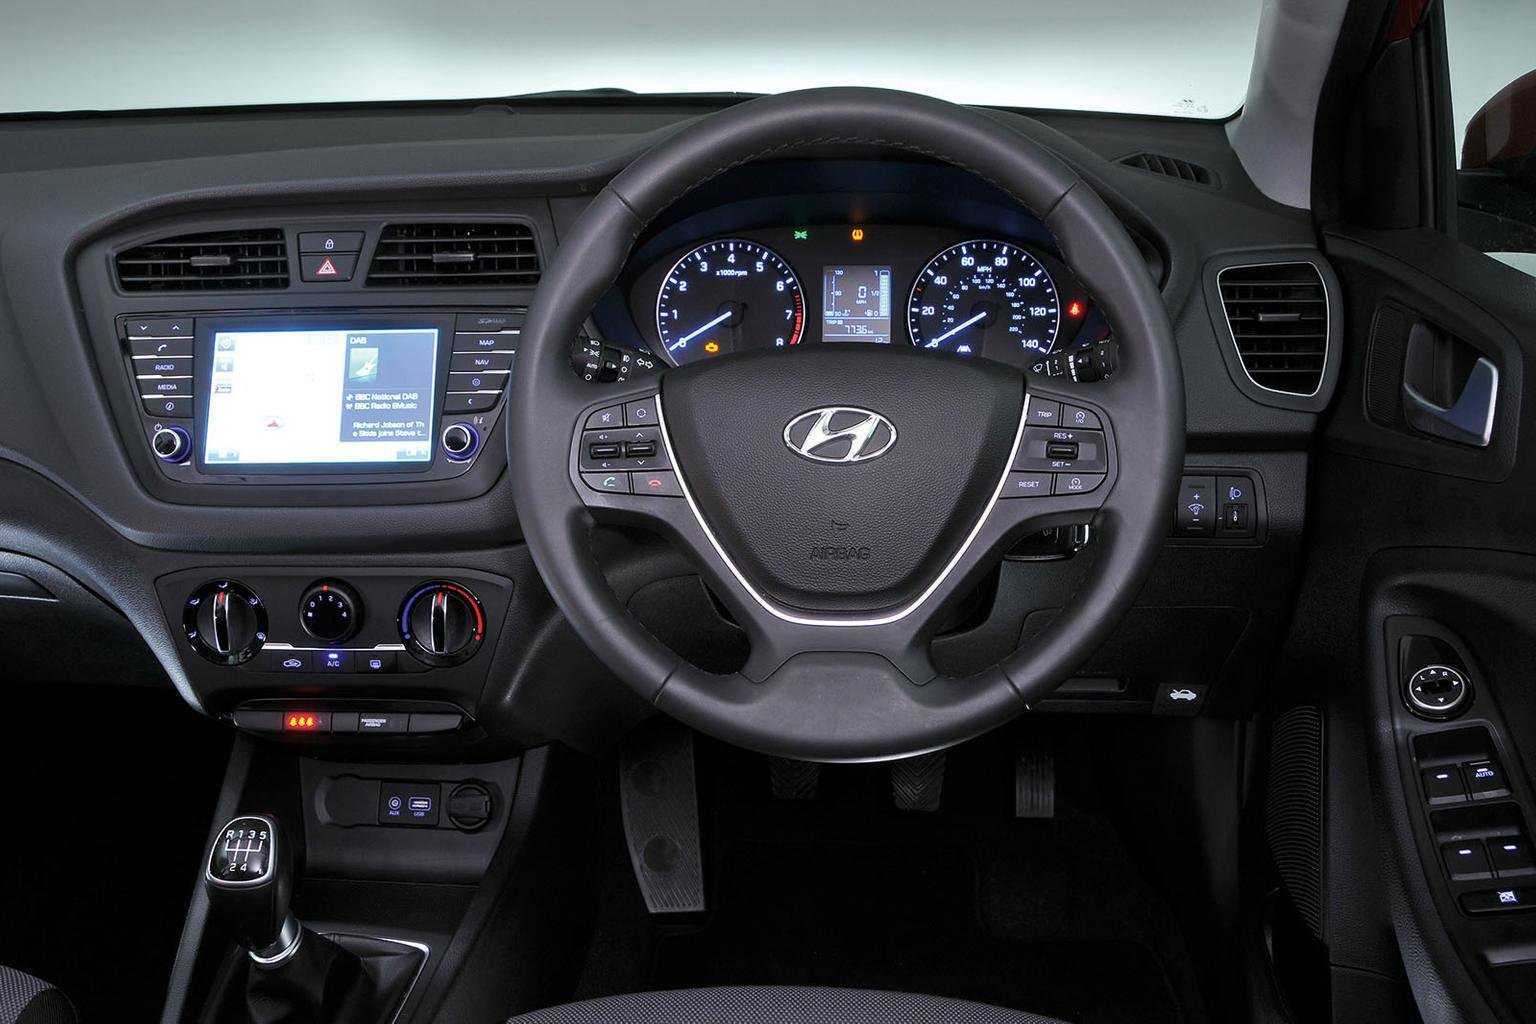 New Suzuki Swift vs Hyundai i20